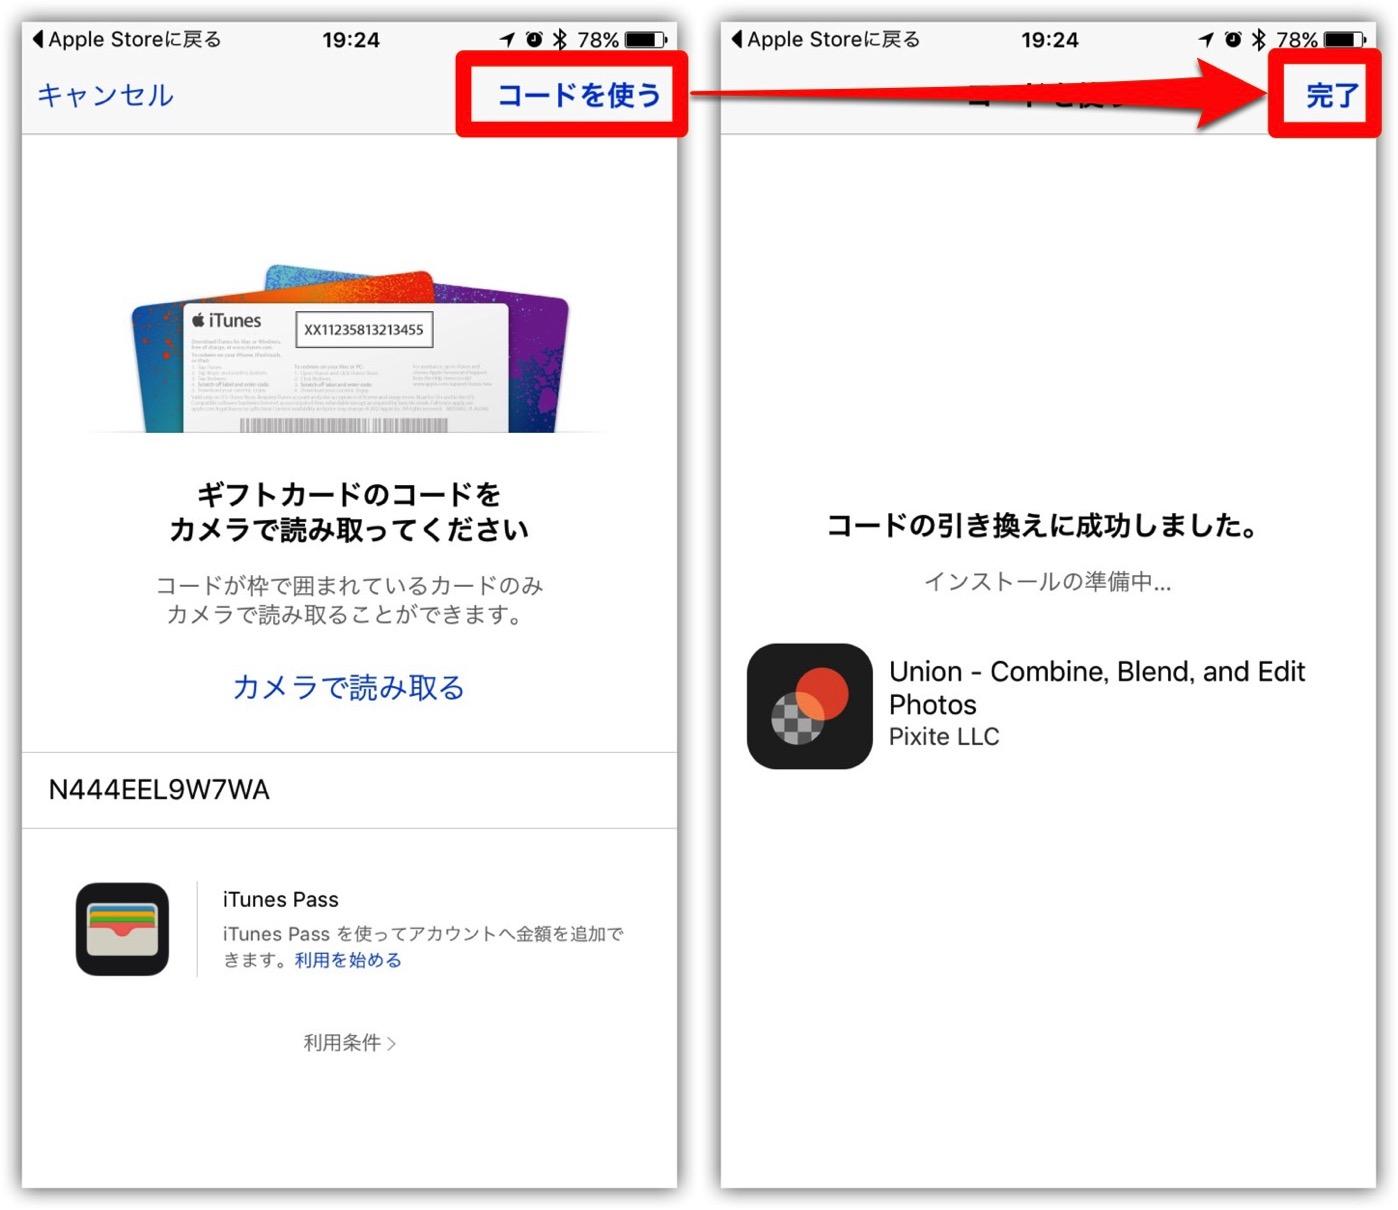 Apple Store-5